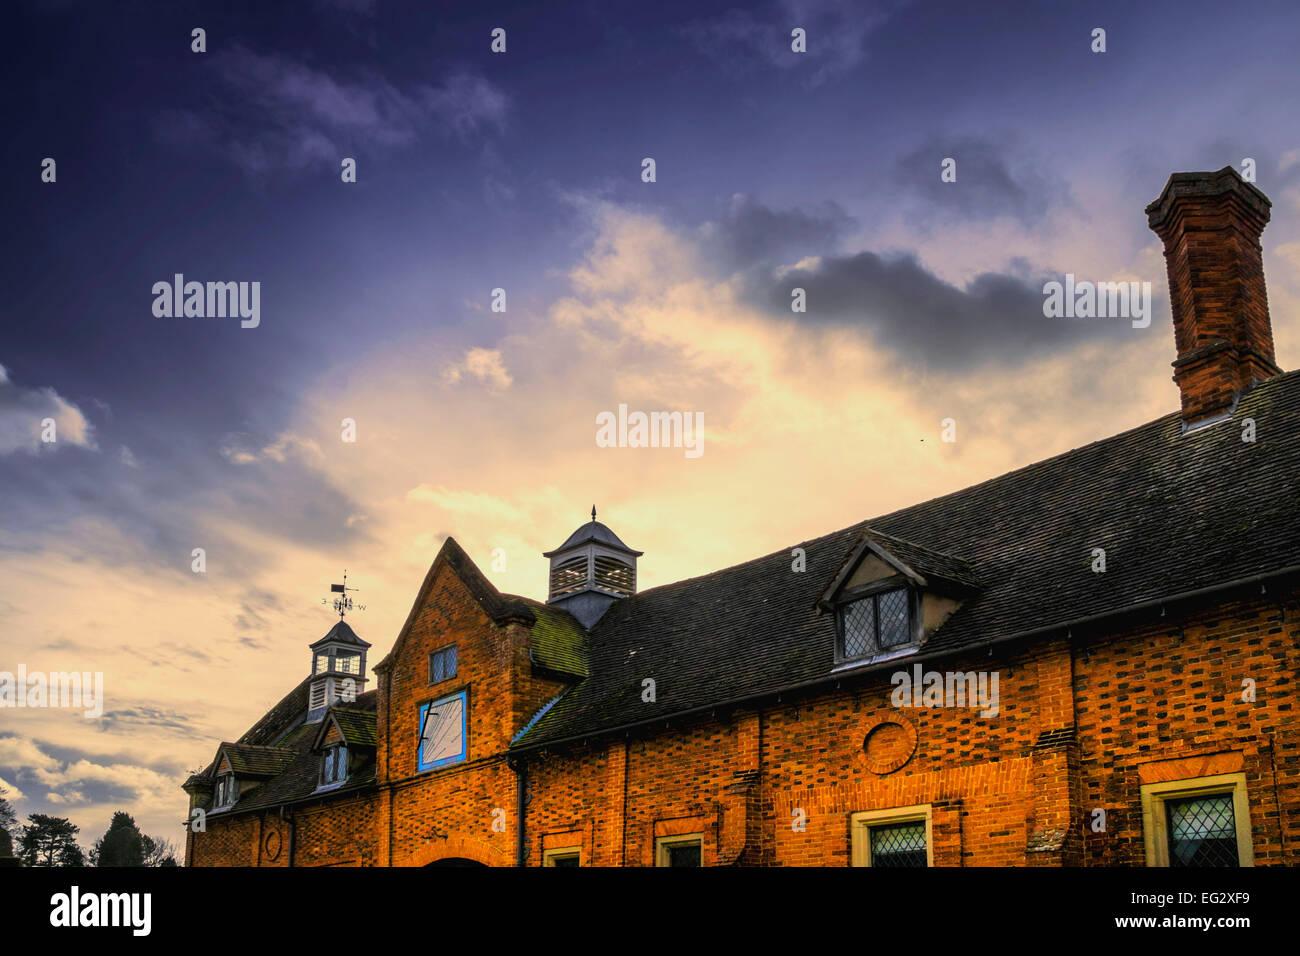 ancient, architecture, aristocracy, aristocratic, beautiful, beauty, britain, british, building, buildings, class, - Stock Image